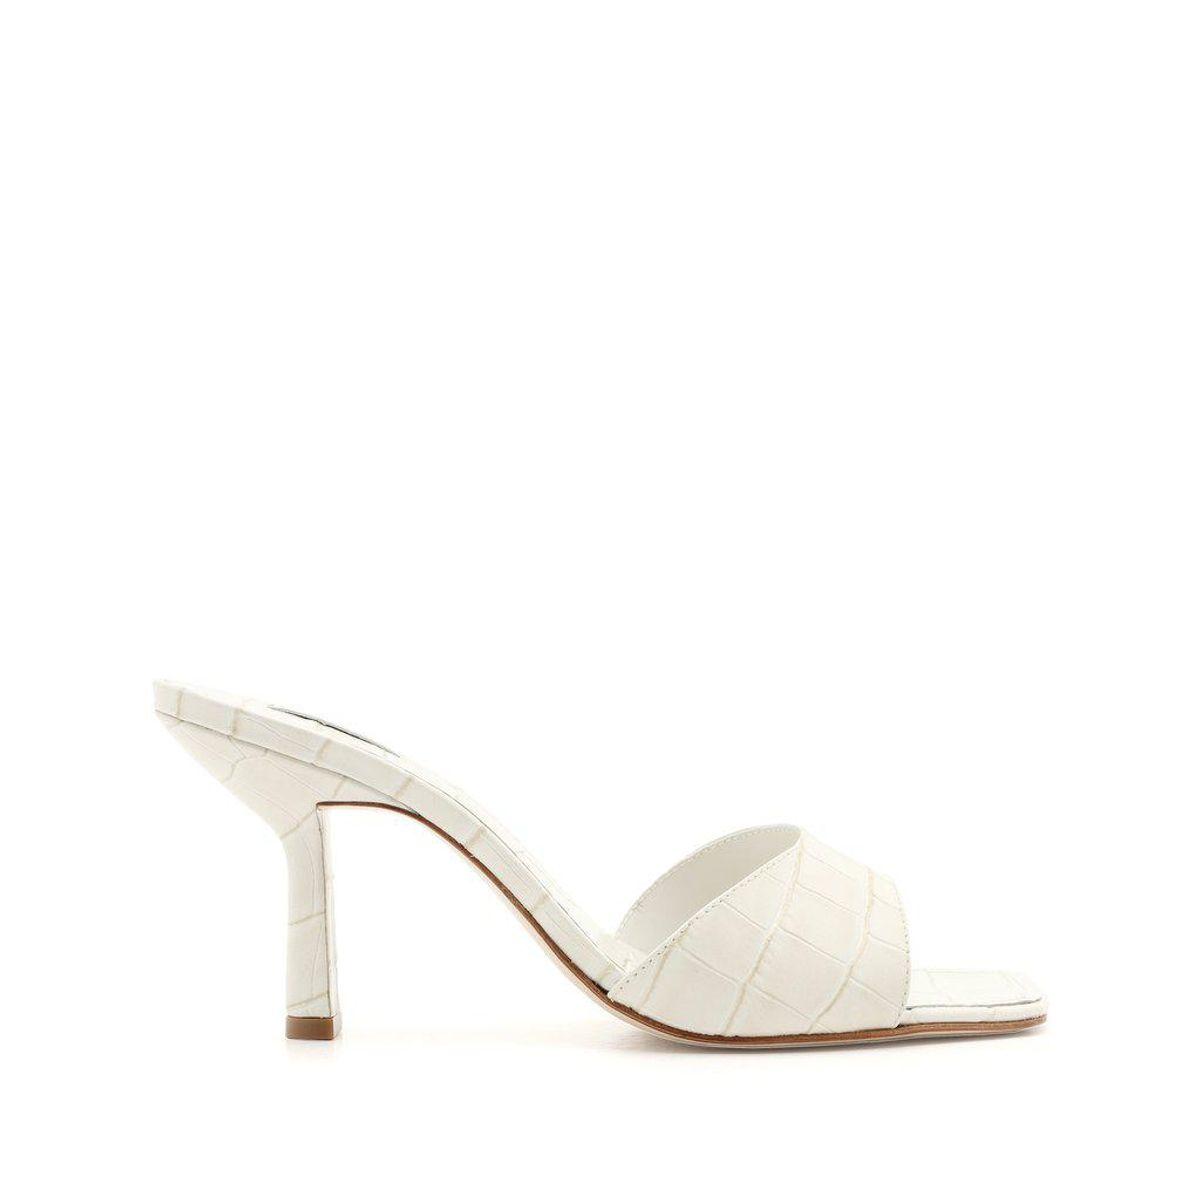 schutz posseni sandal